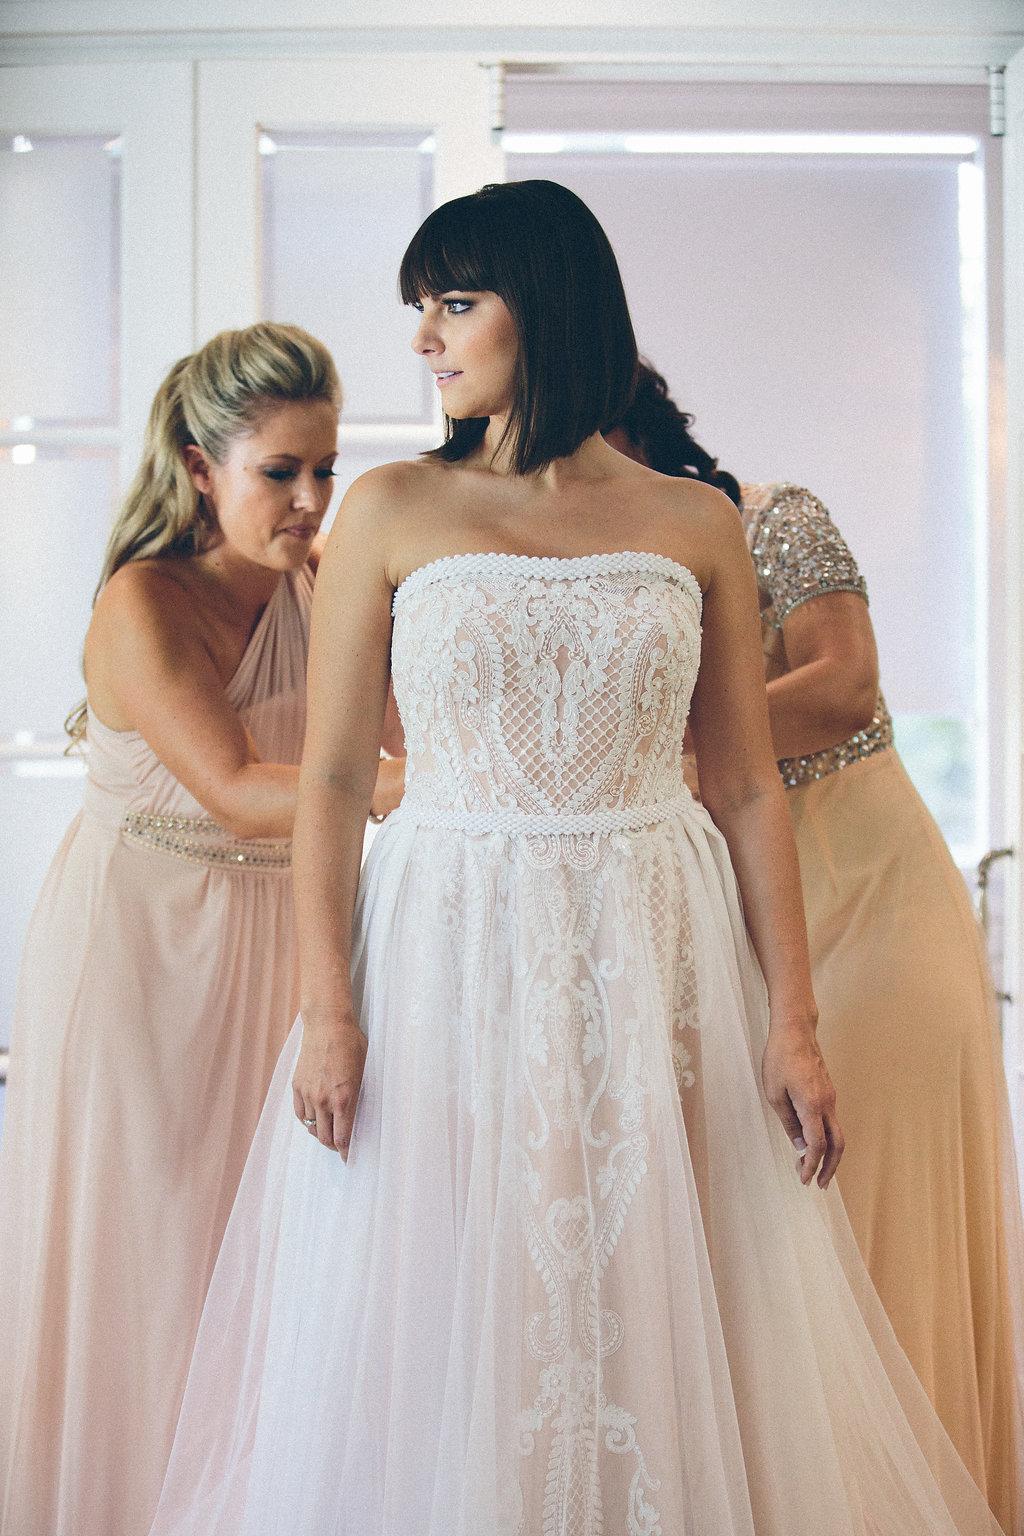 ROBYN - Wedding Dress by Janita Toerien - Photo by Shanna Jones